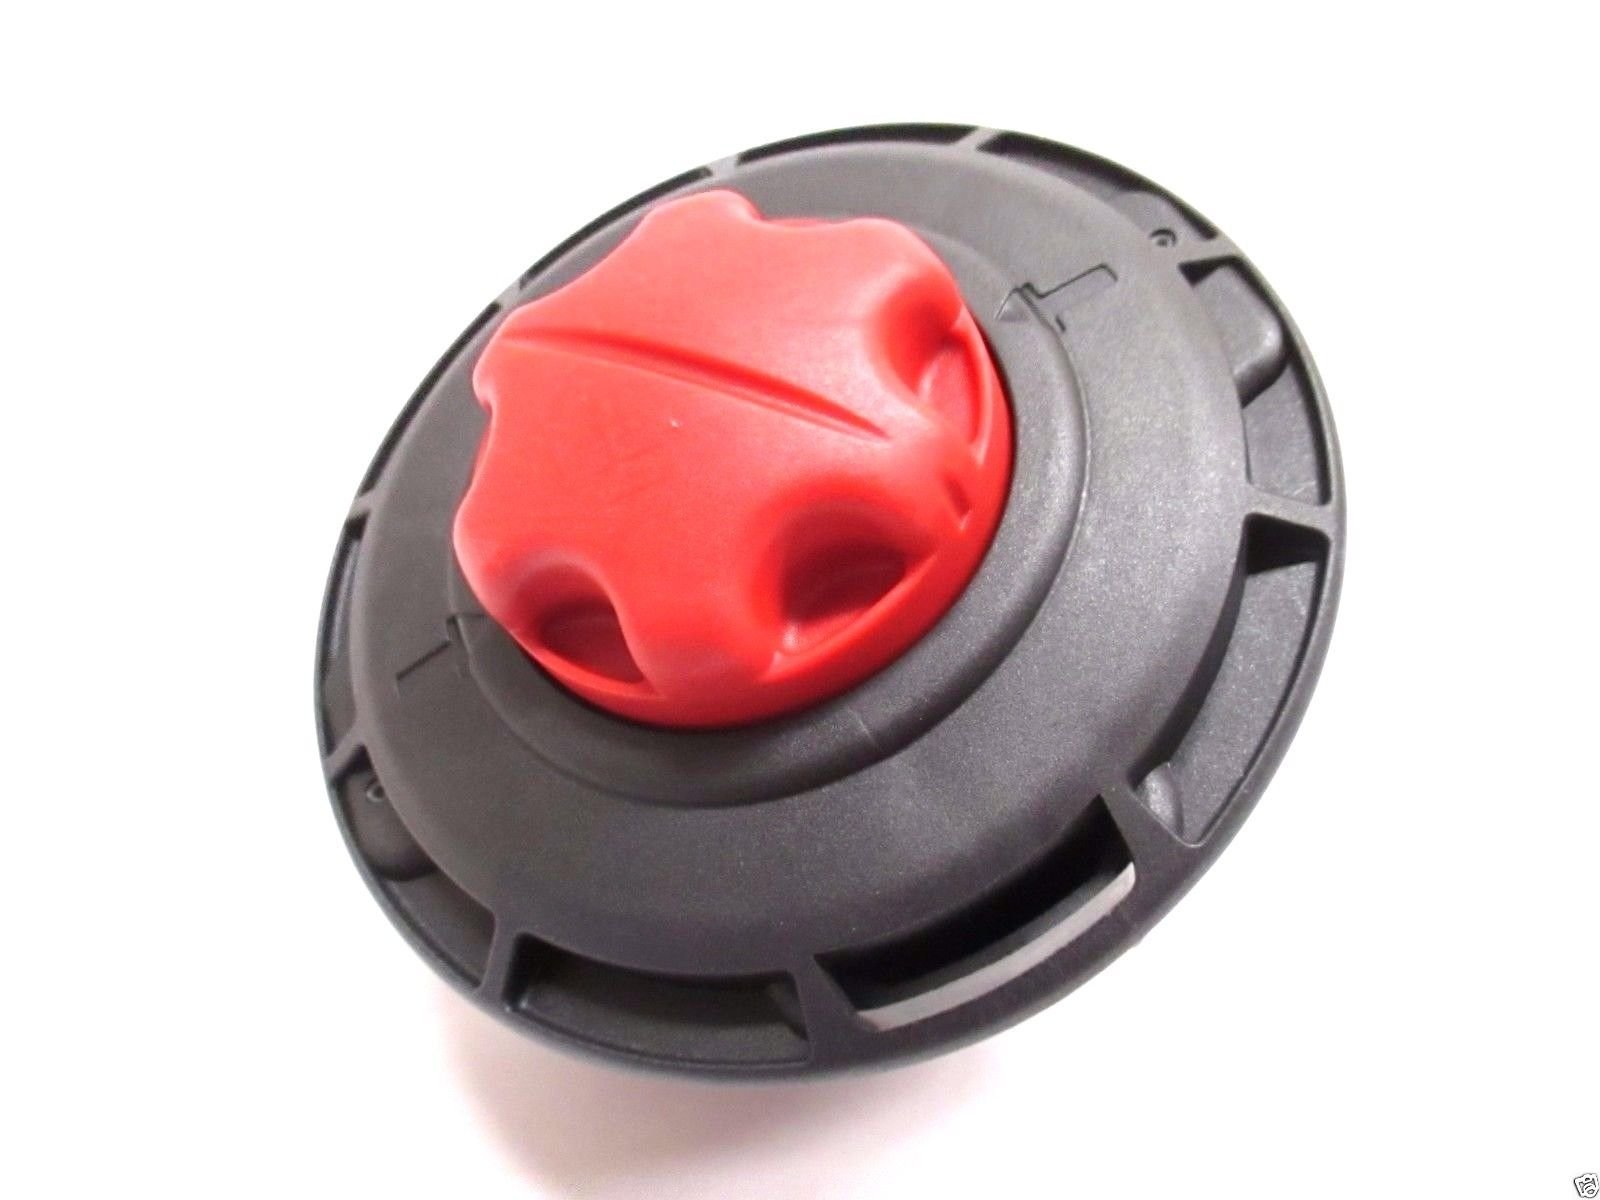 Homelite 308923014 Easy Reel Trimmer Head Fits Toro 51954 51955 51974 51975